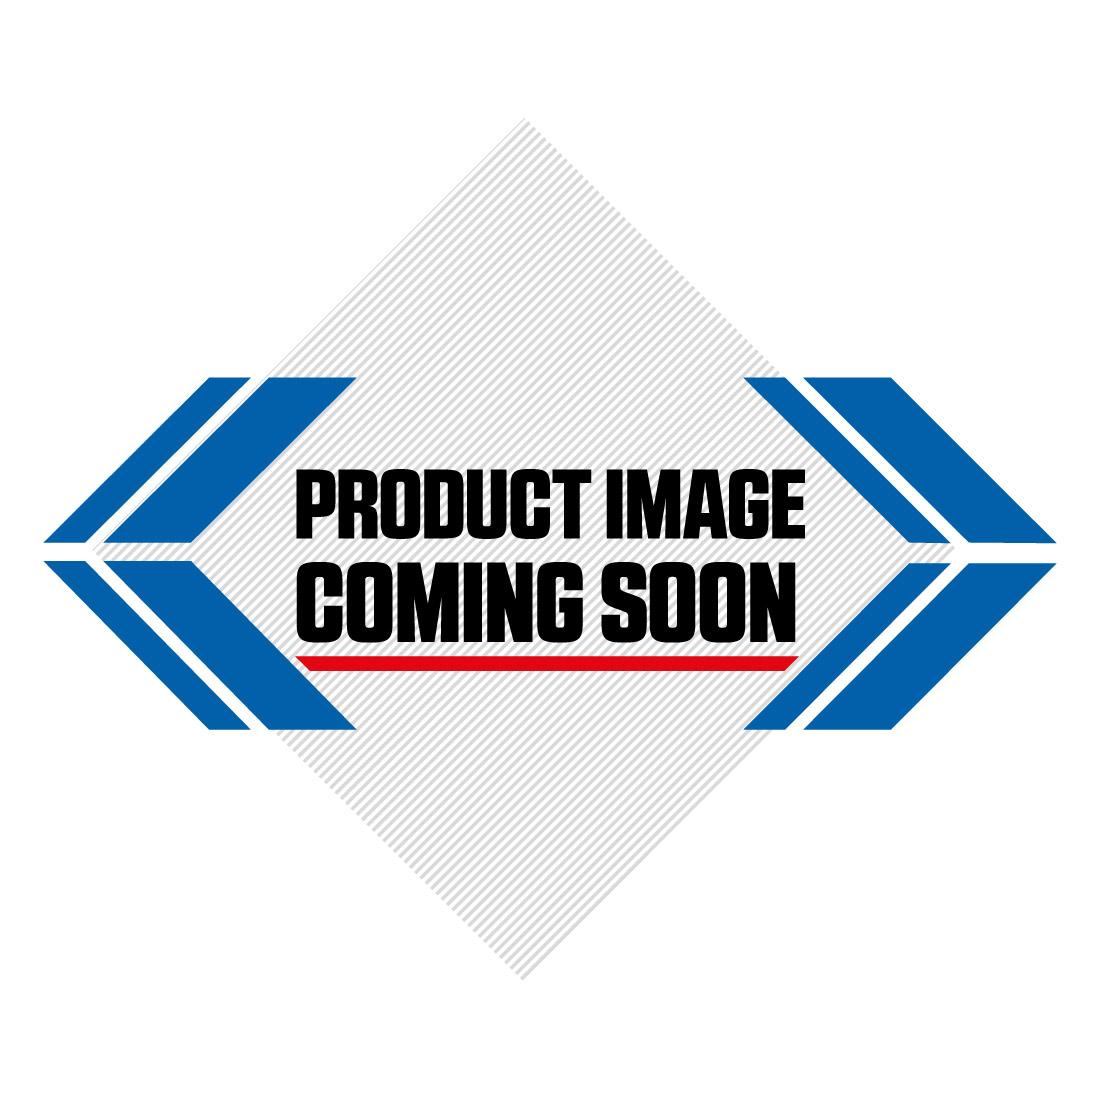 DJI Mavic 2 Pro Drone Image-4>